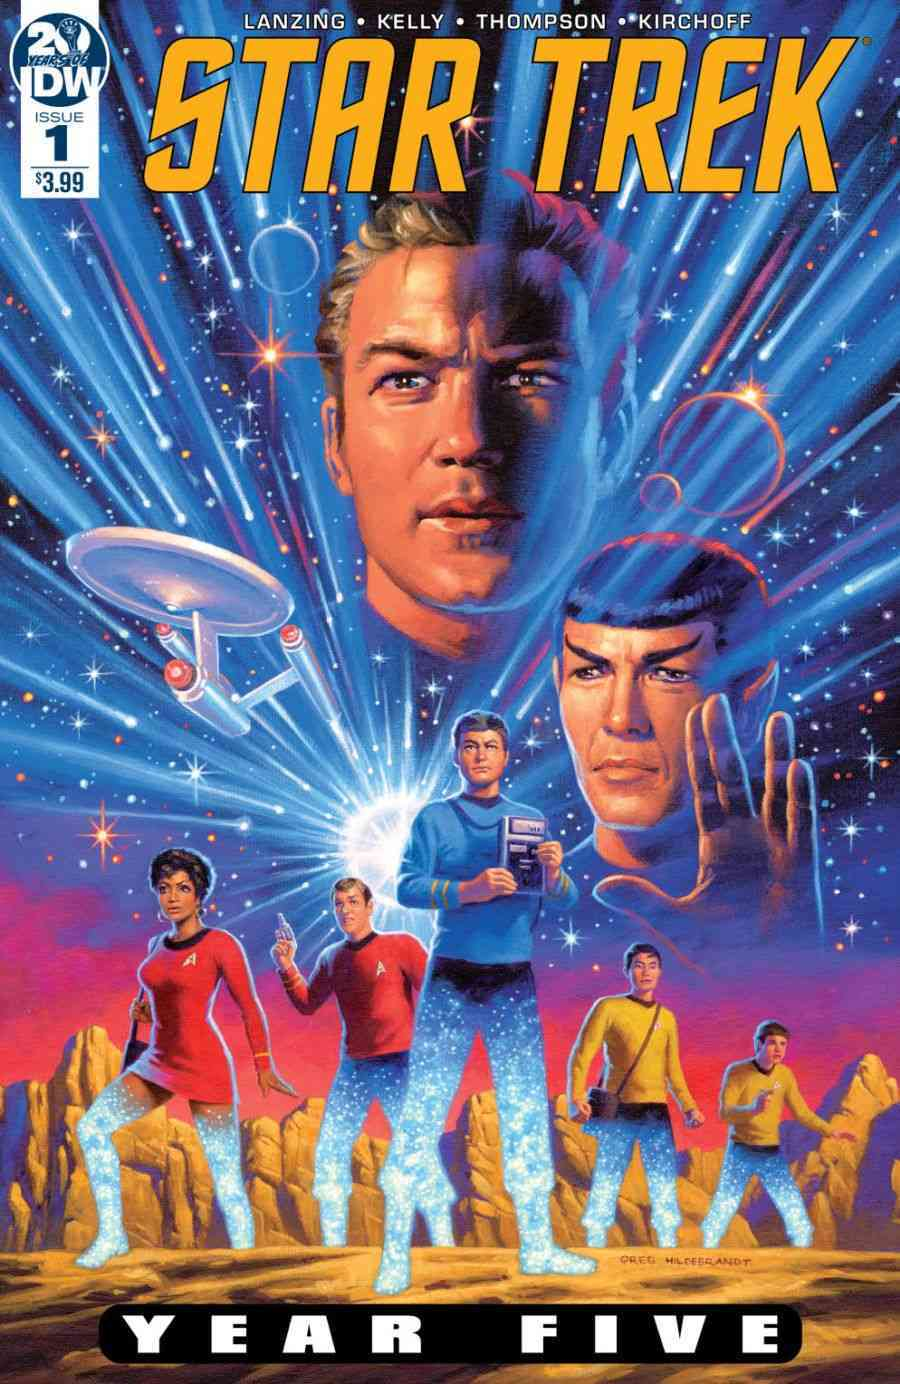 Star_Trek_Year_Five-01-pr (1)_1